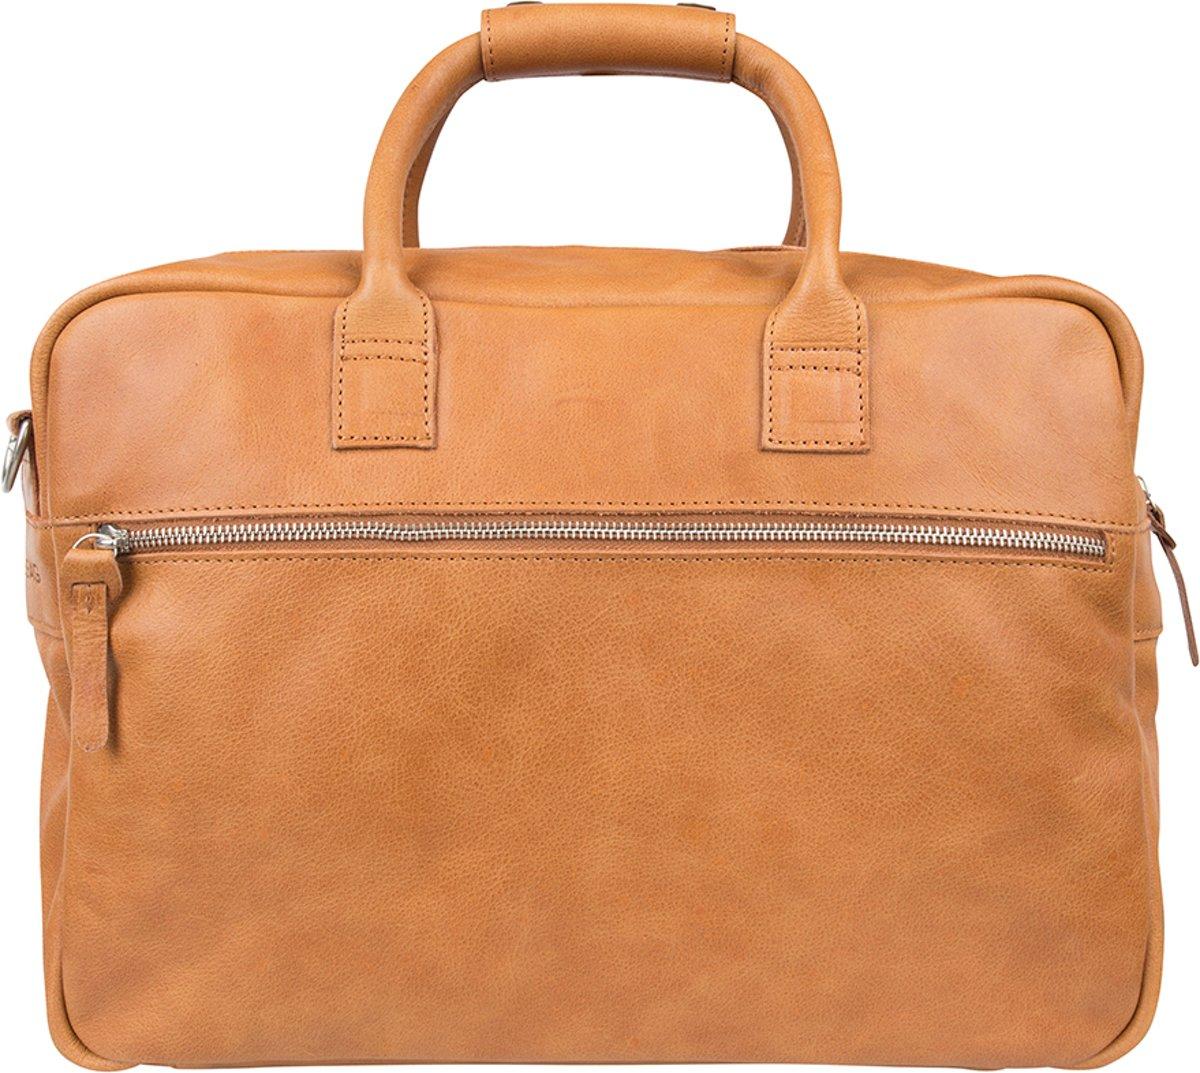 875bf2f2dbd bol.com | Cowboysbag The Bag - Schoudertas - Tobacco